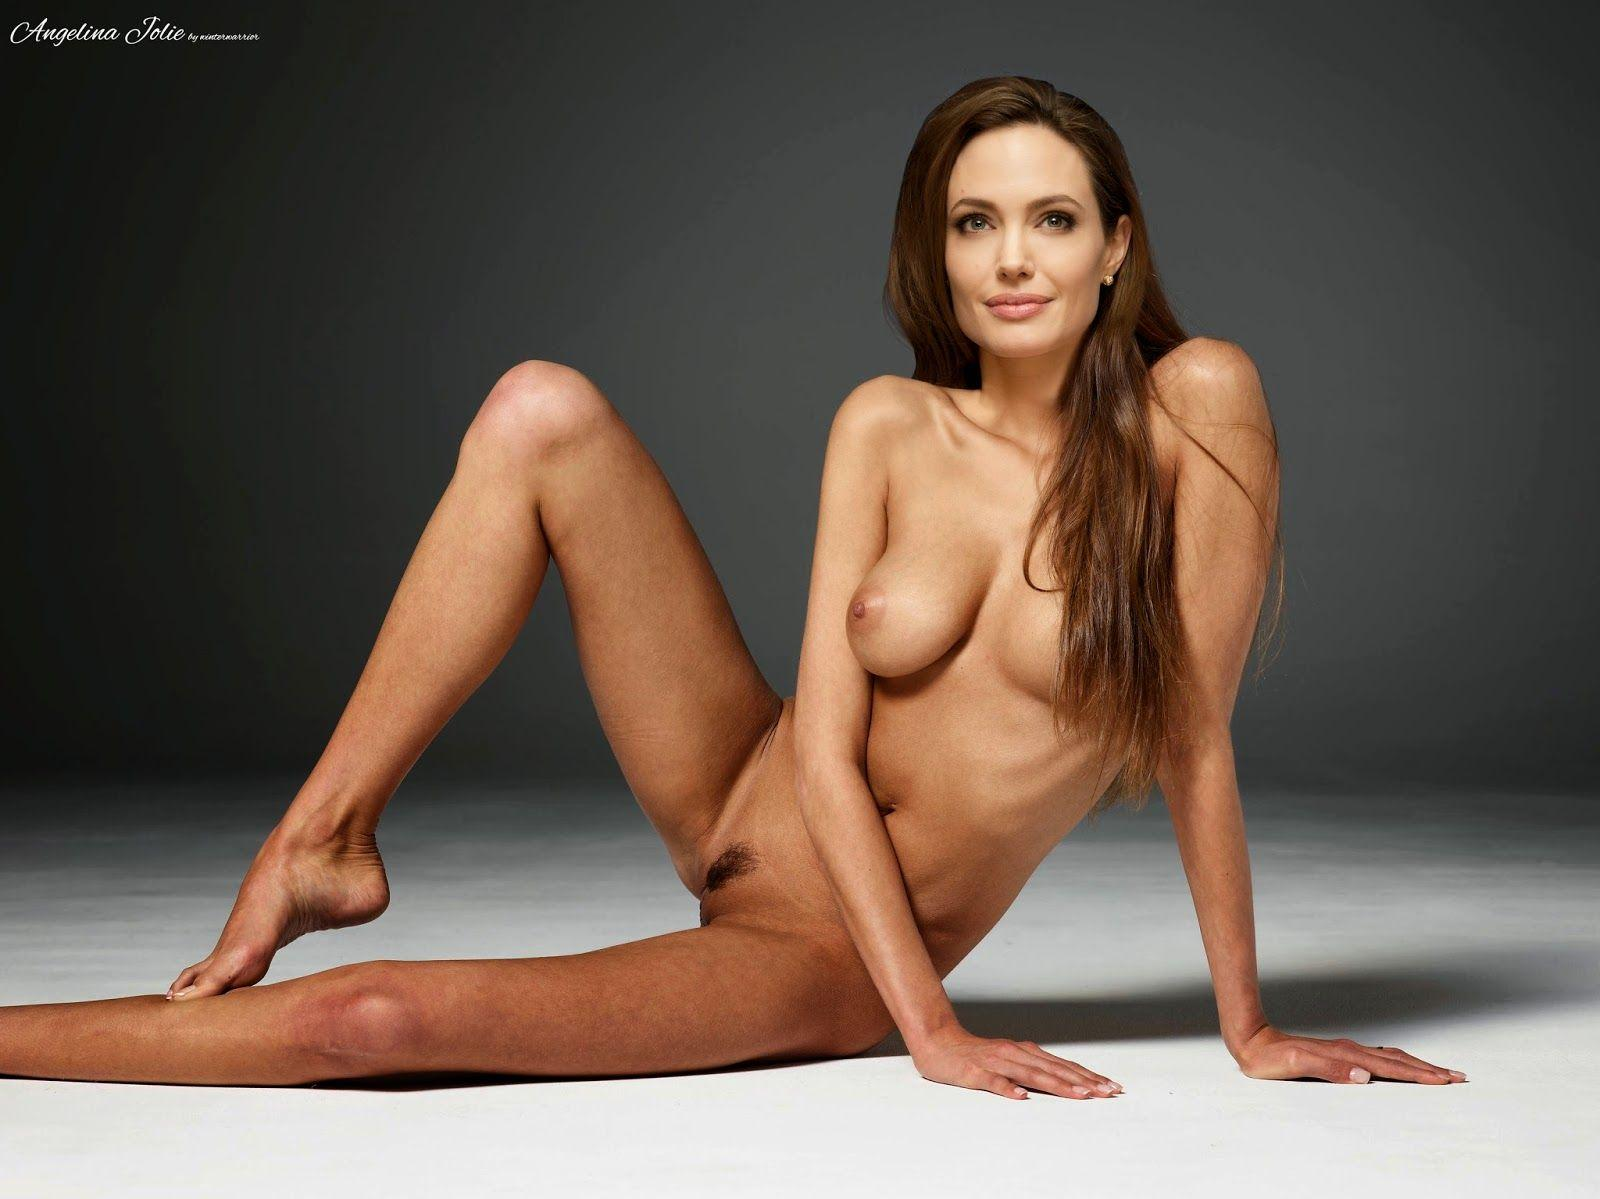 Sasha grey creampie anal